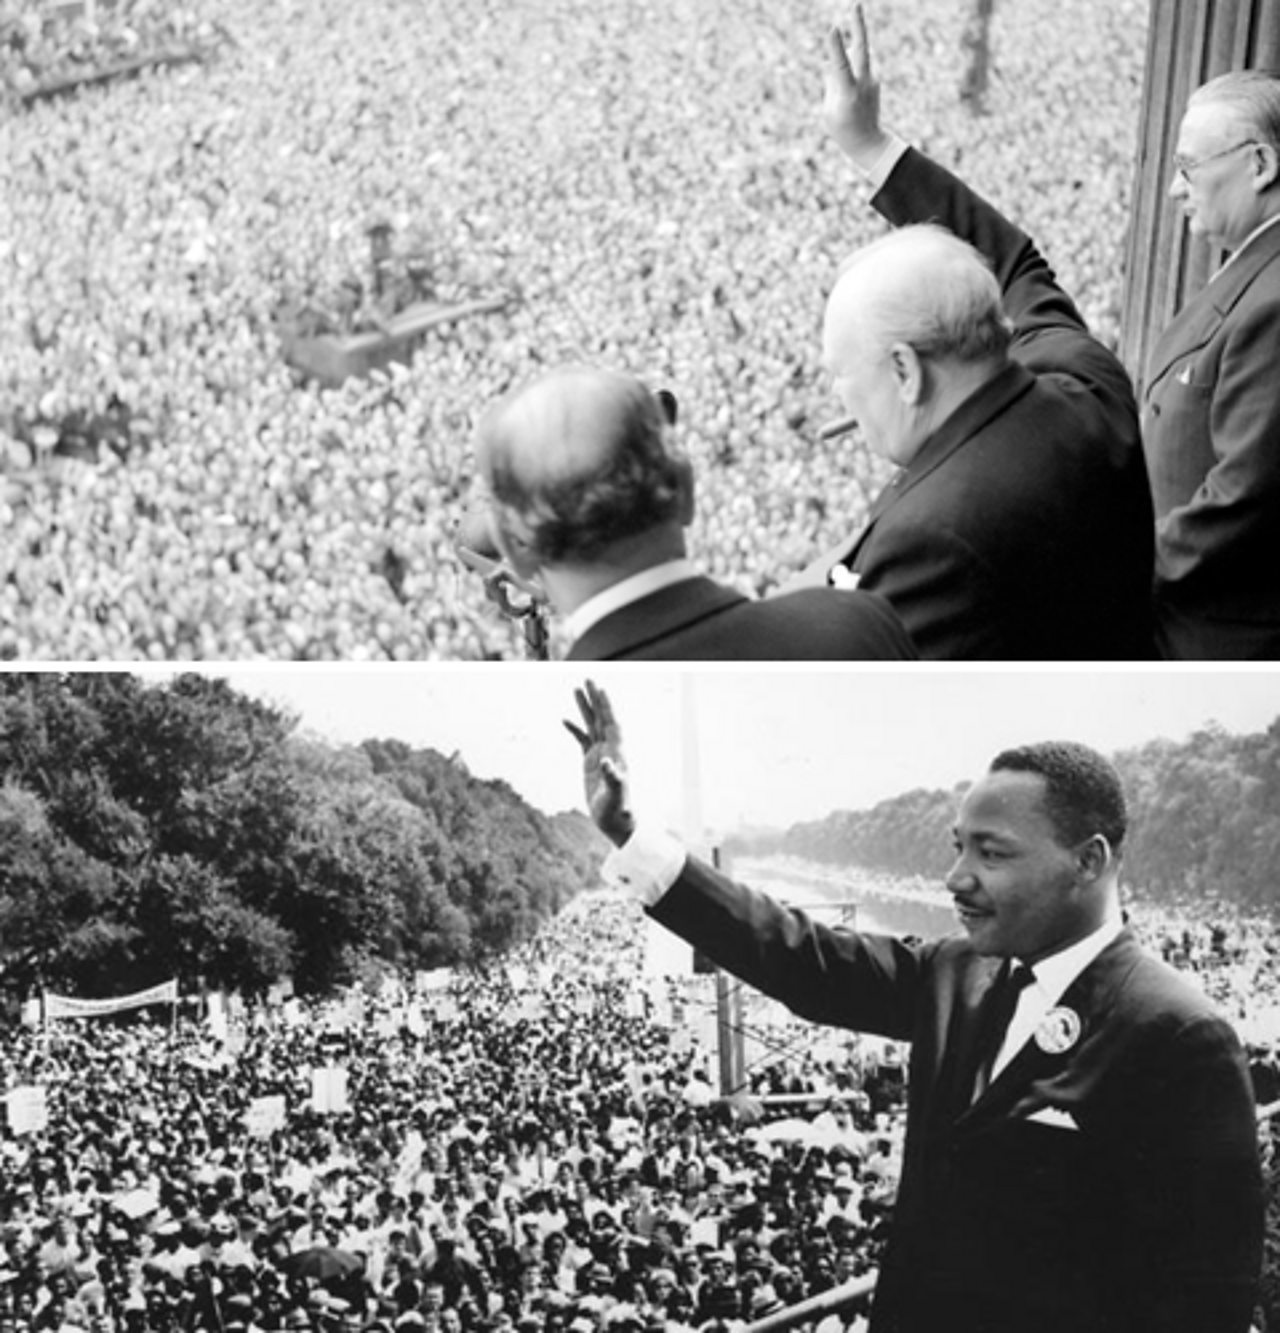 Top: Winston Churchill. Bottom: Martin Luther King Jr.